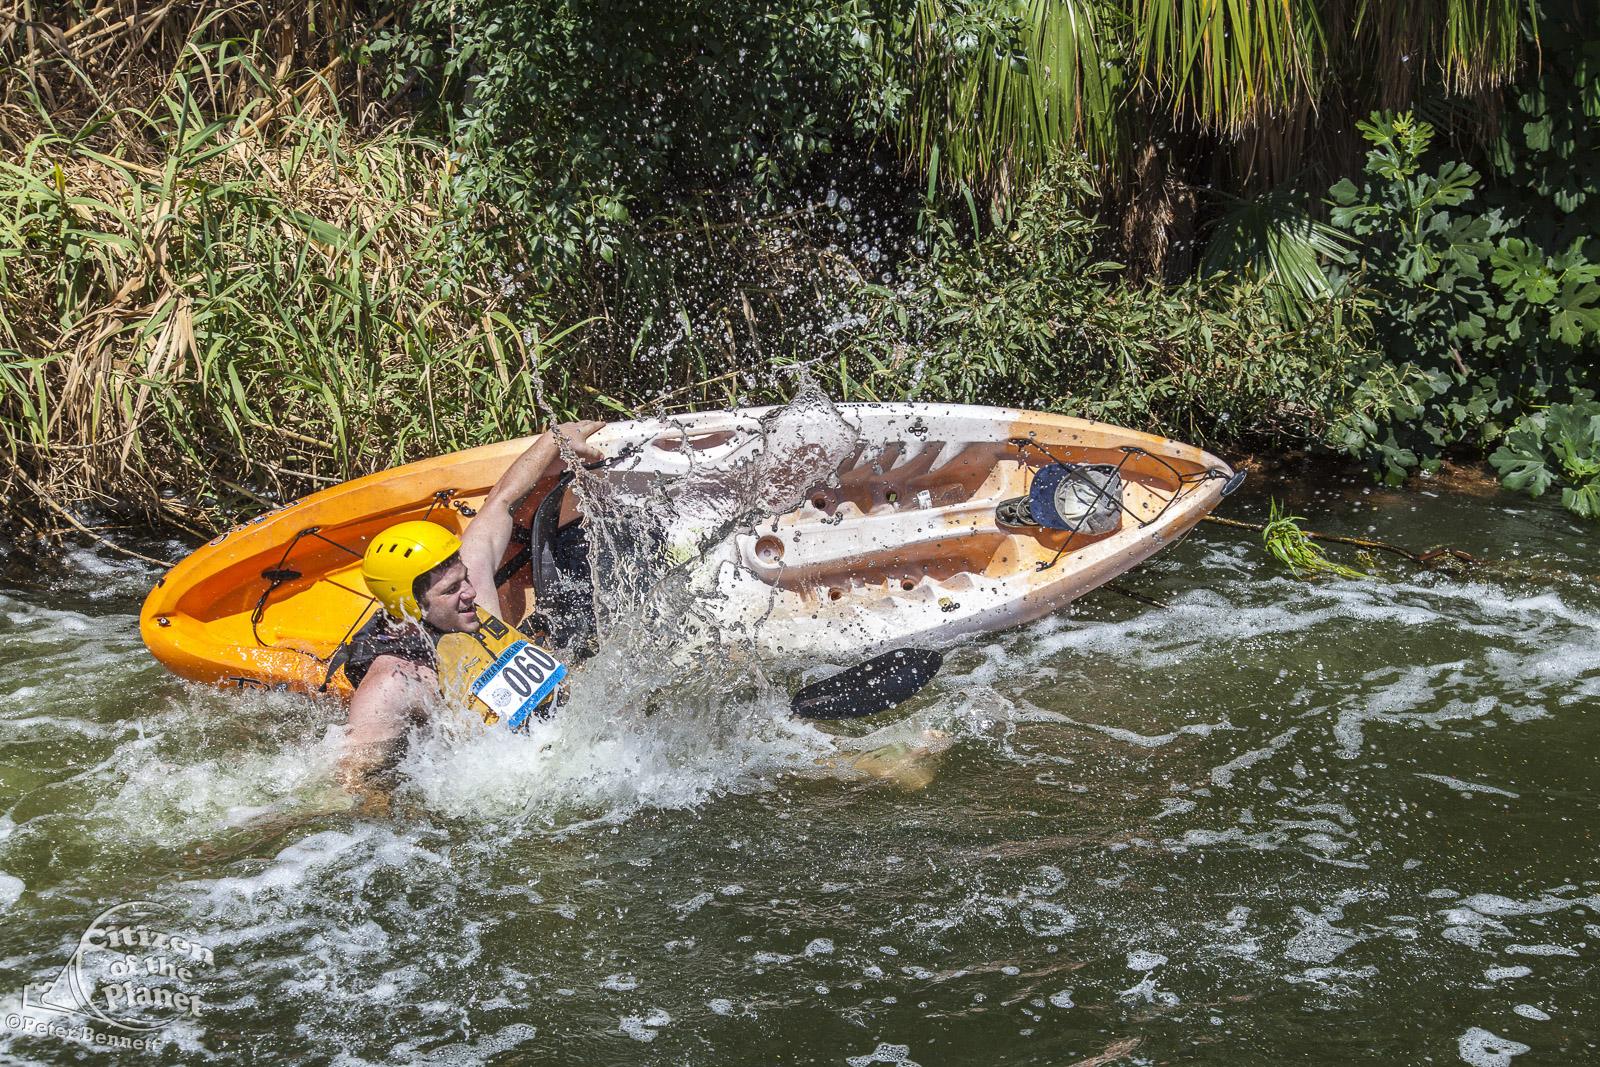 US_CA_48_3877_la_river_boat_race.jpg